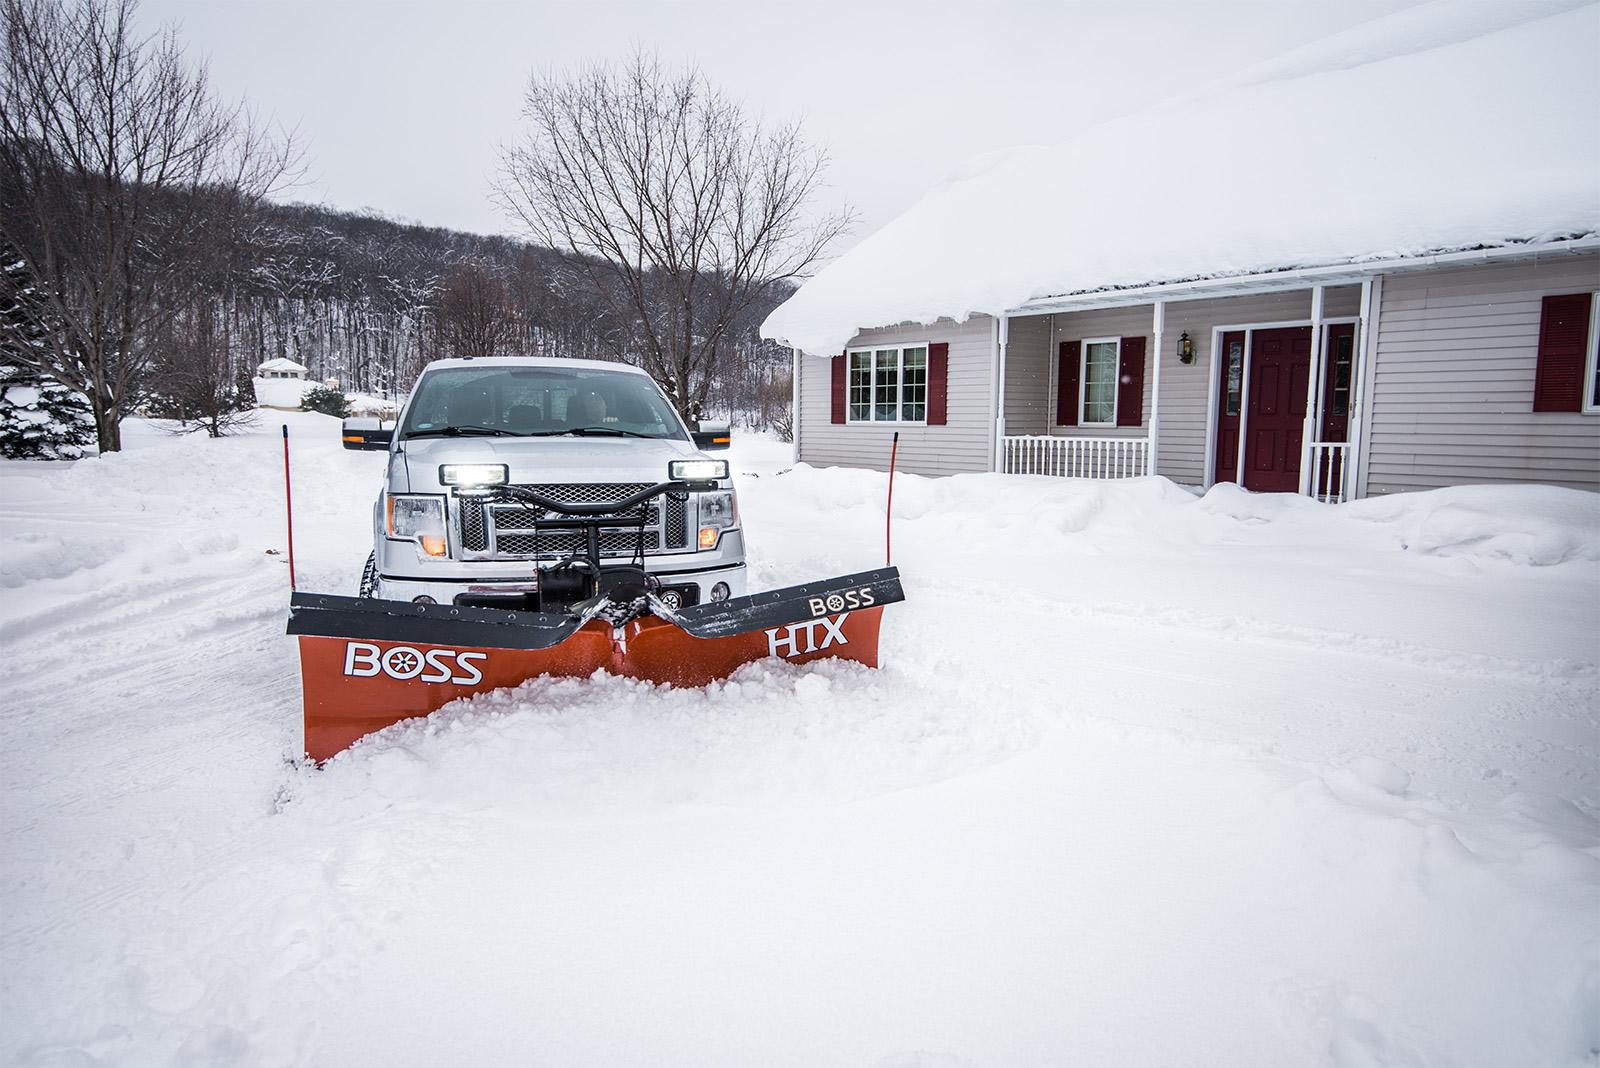 Boss Snowplow Introduces Htx V Plow For Light Duty Trucks